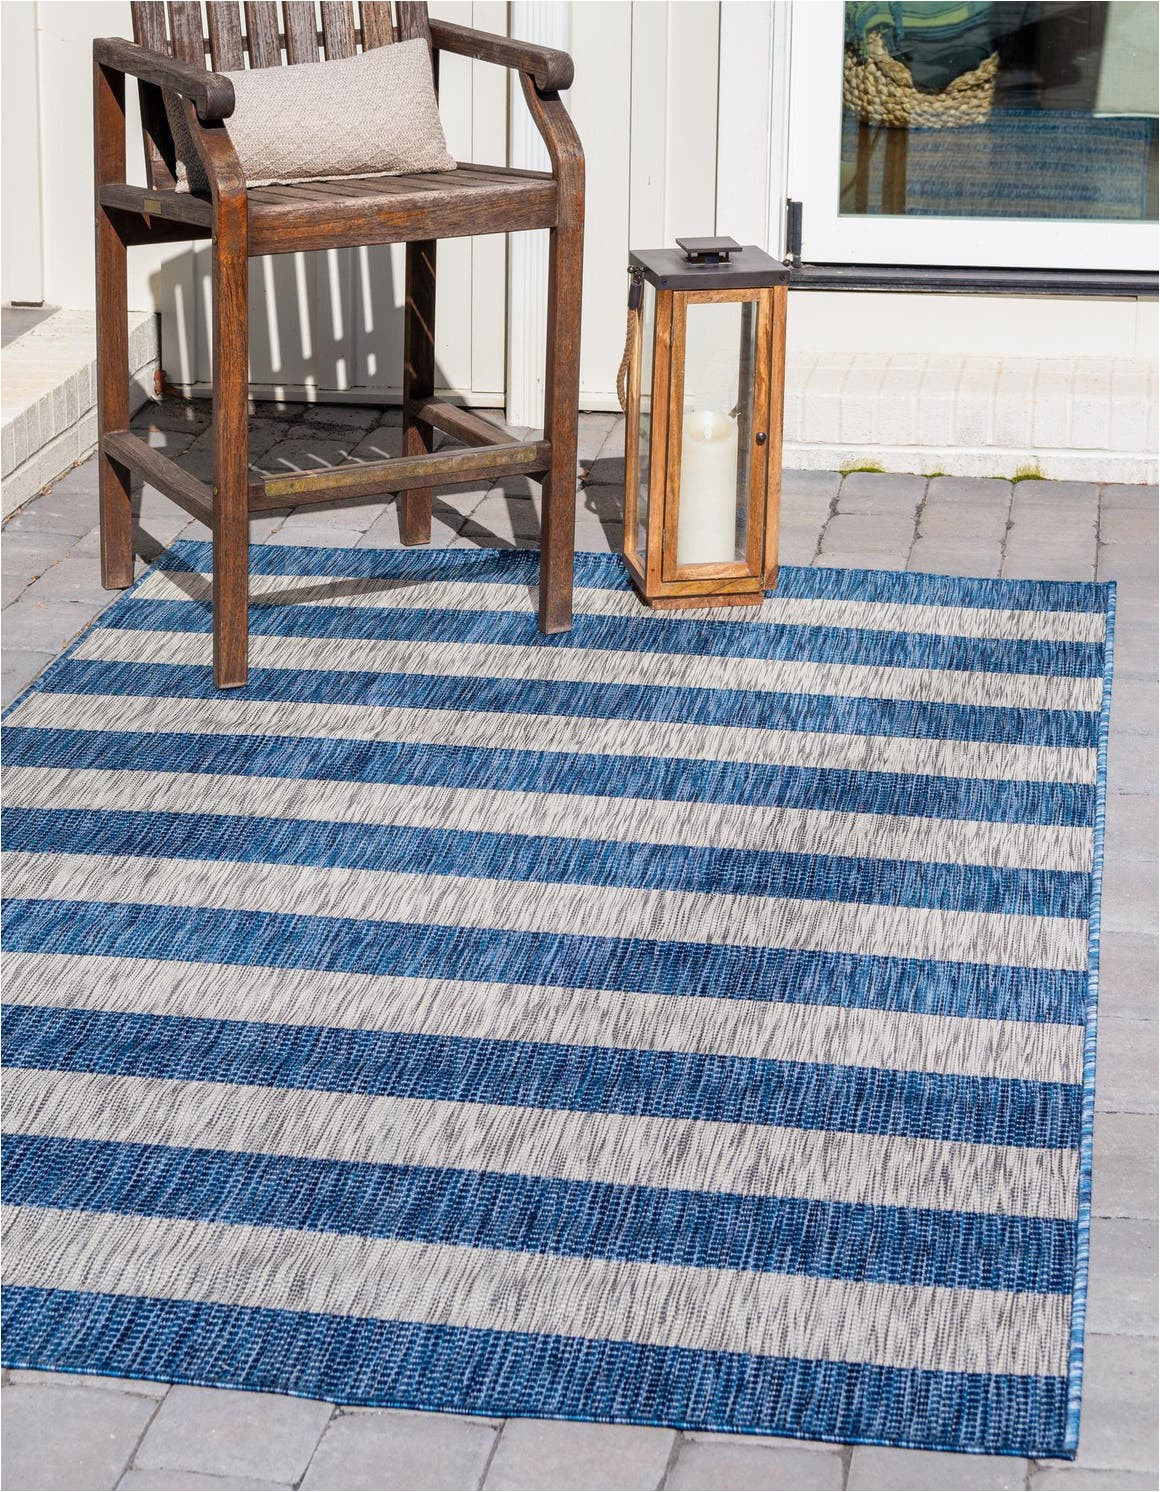 Blue Outdoor Rug 9×12 9 X 12 Outdoor Striped Rug